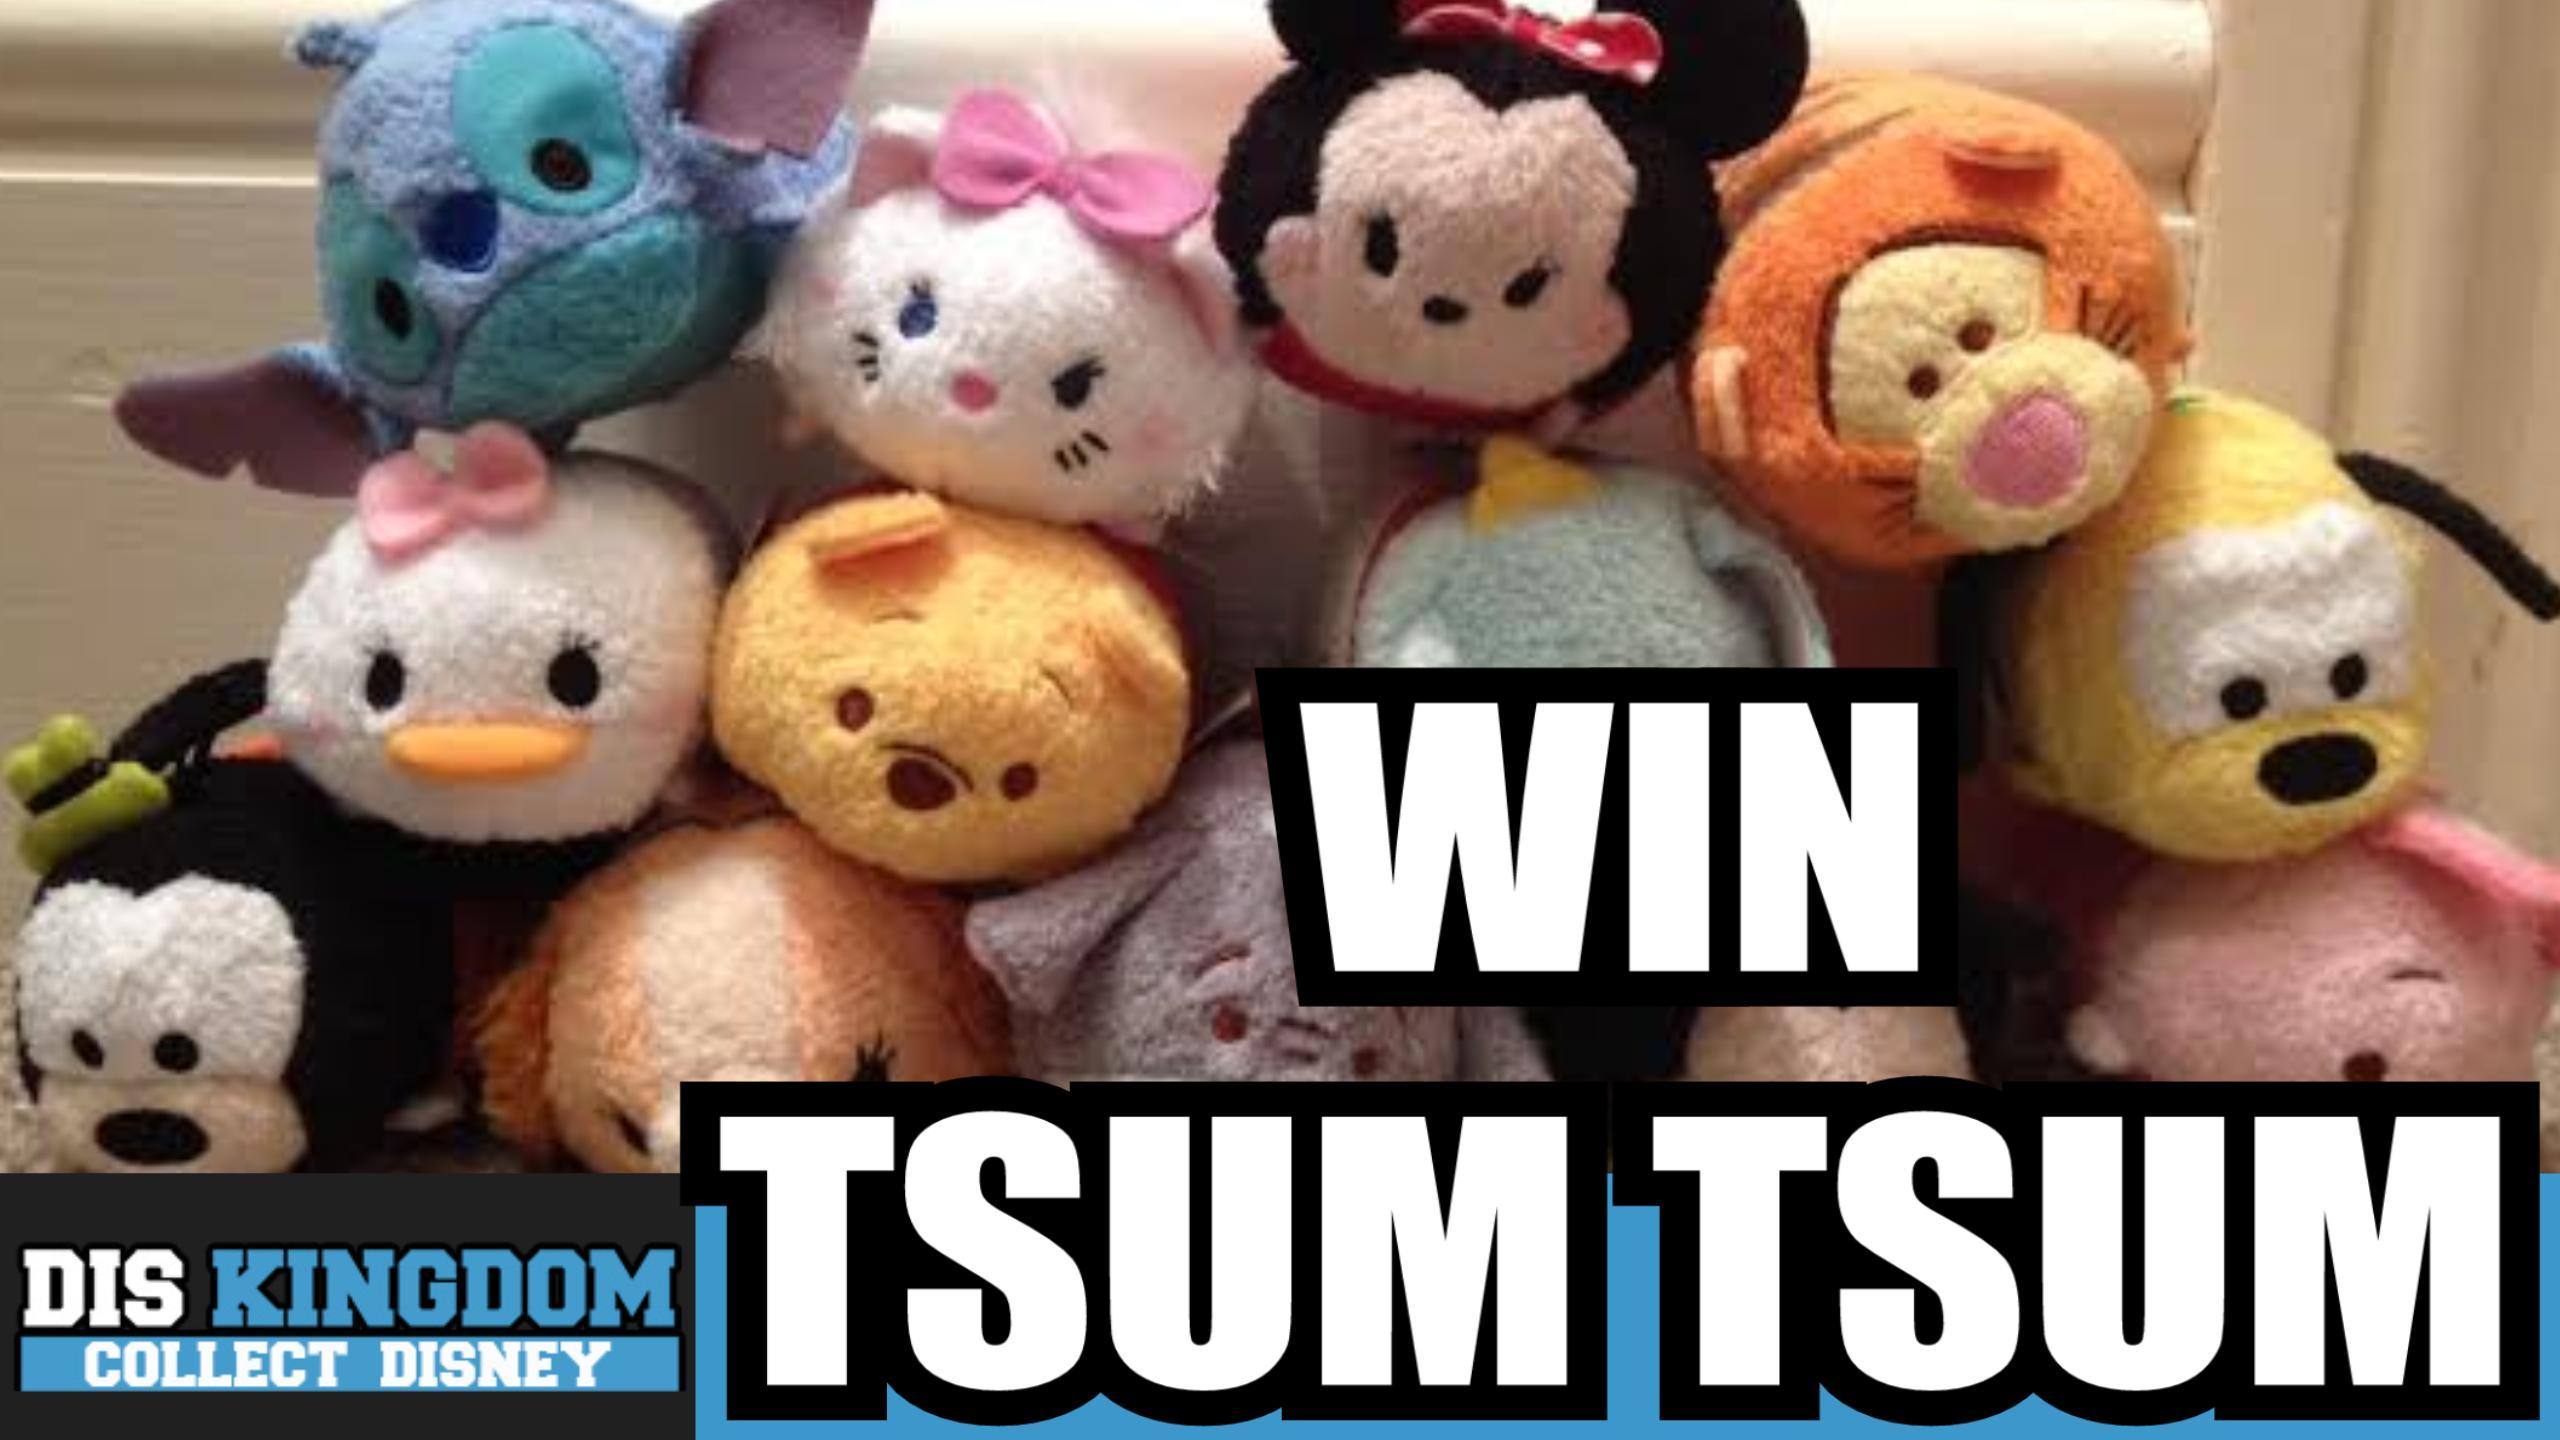 Disney Tsum Tsum Haul & Review + WIN Some Tsum Tsum's